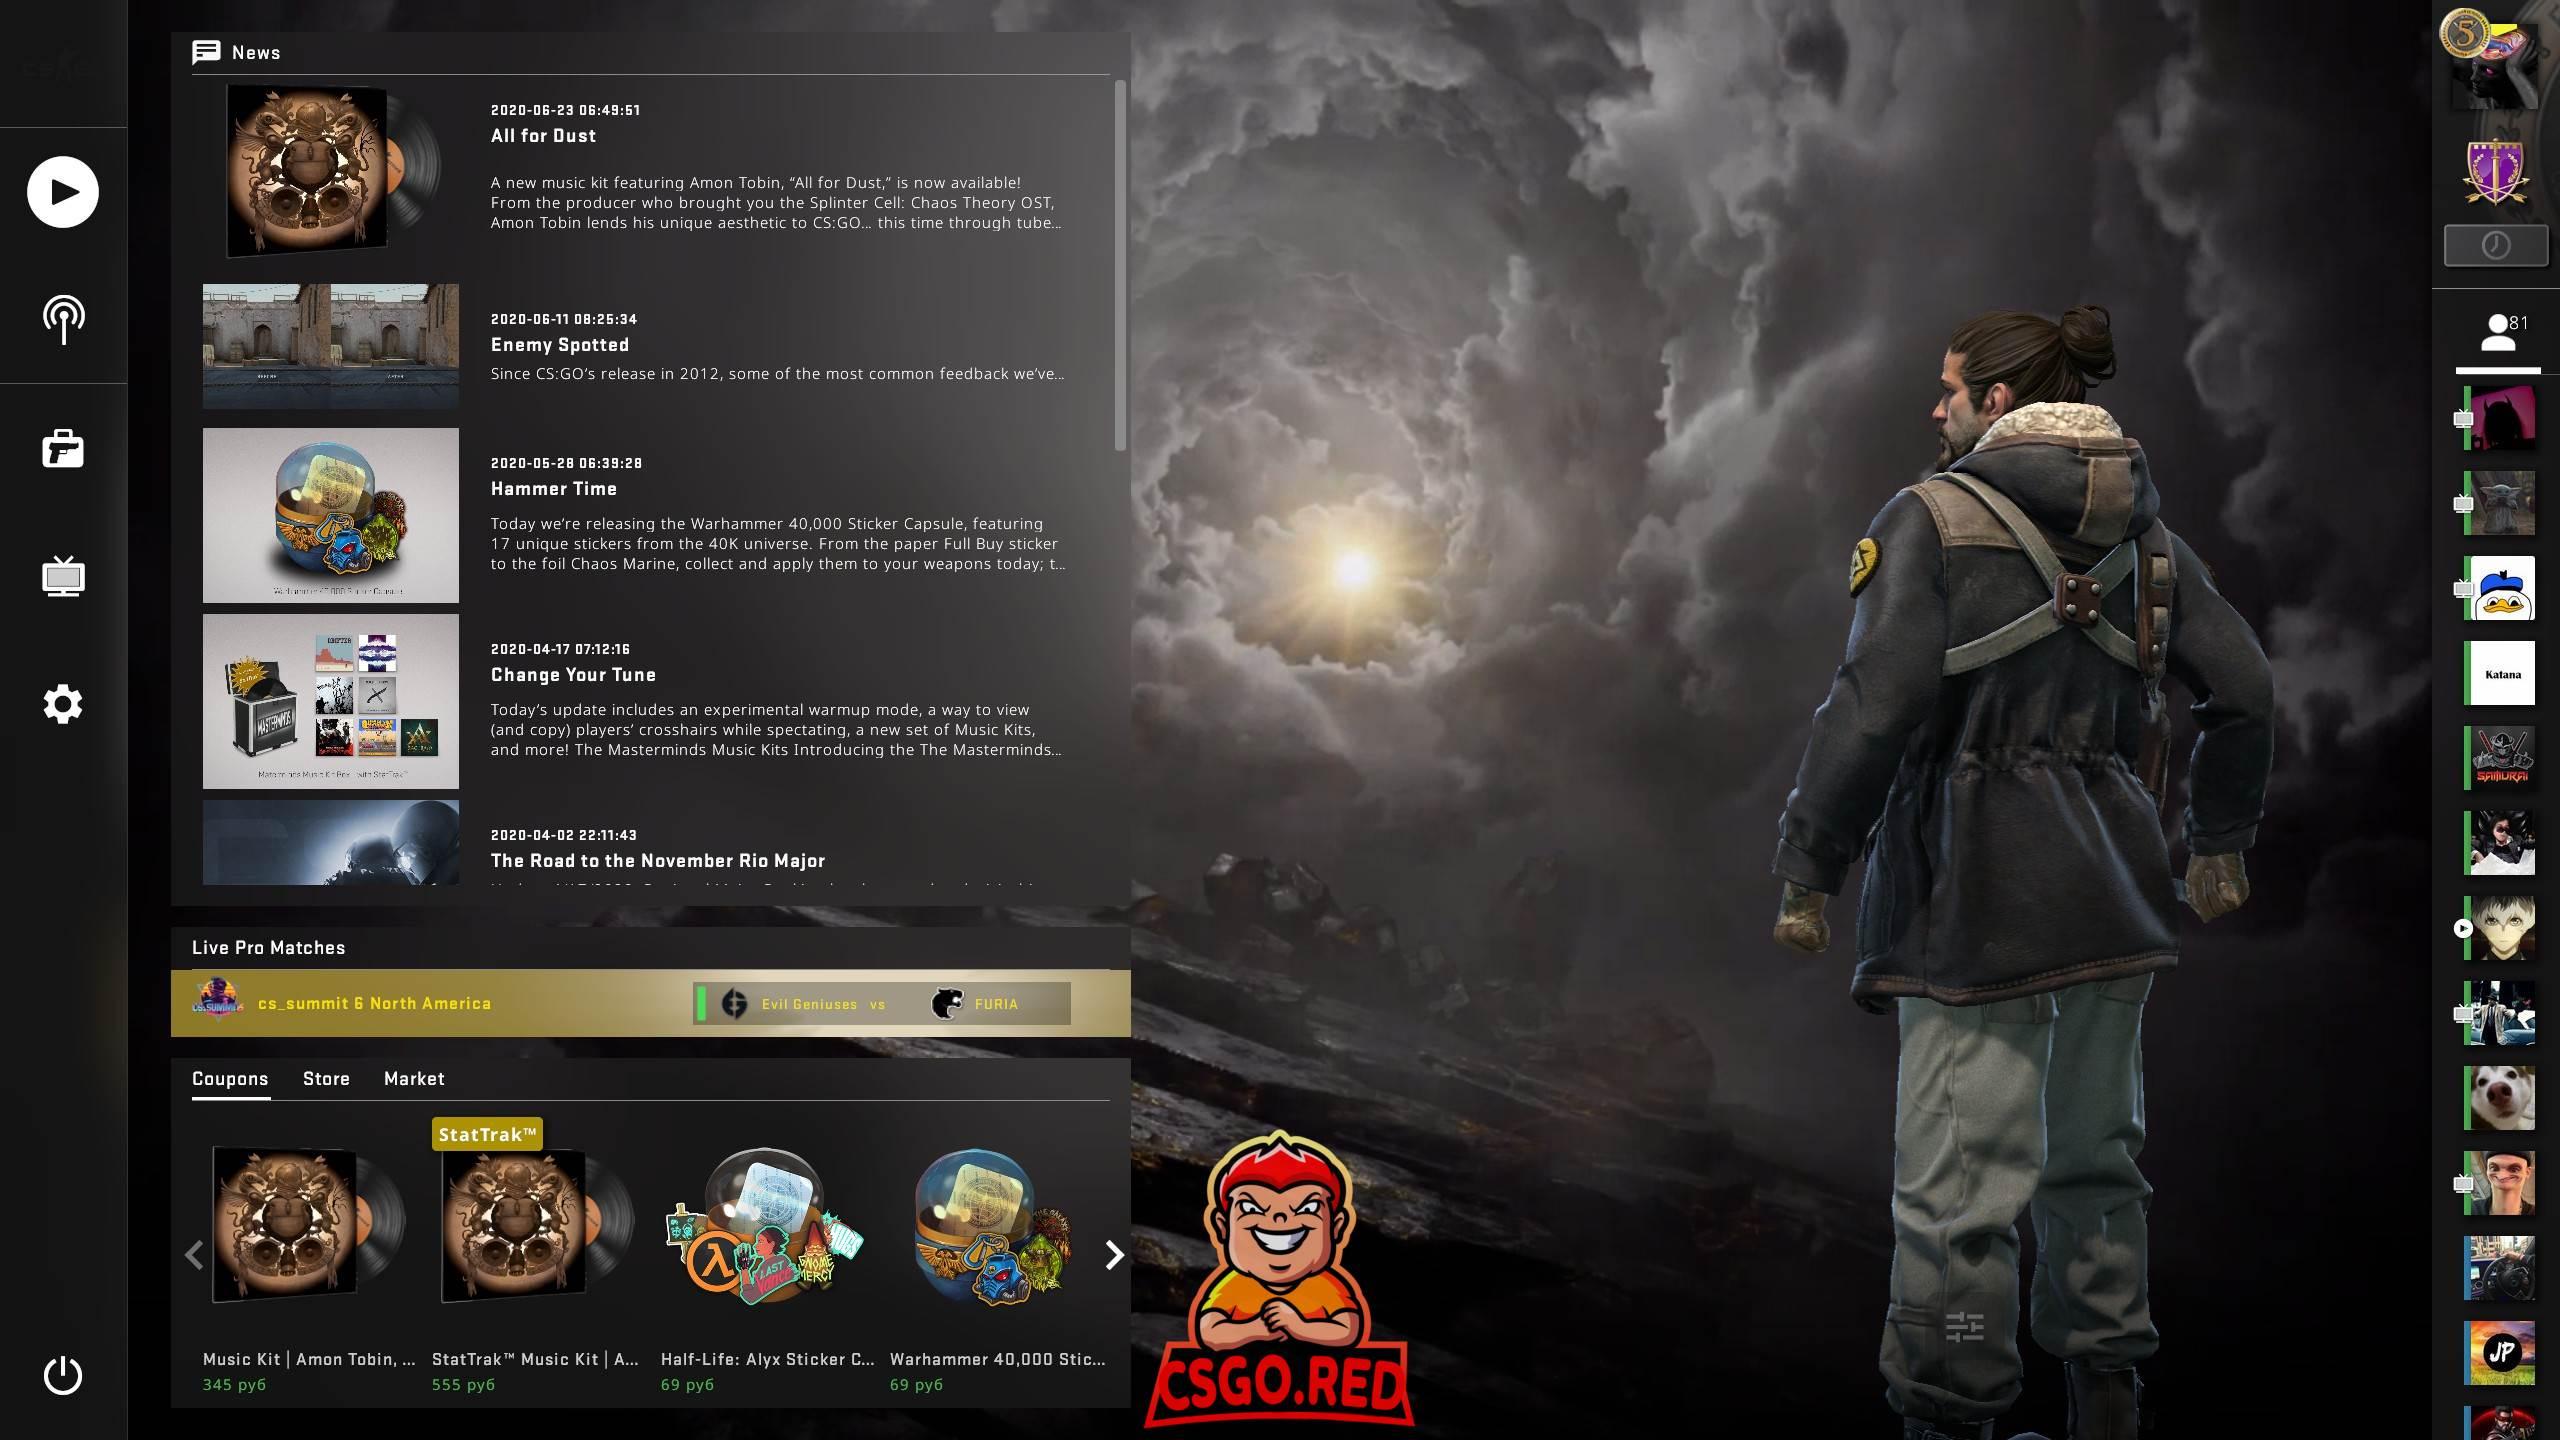 Dota 2 animated panorama UI background